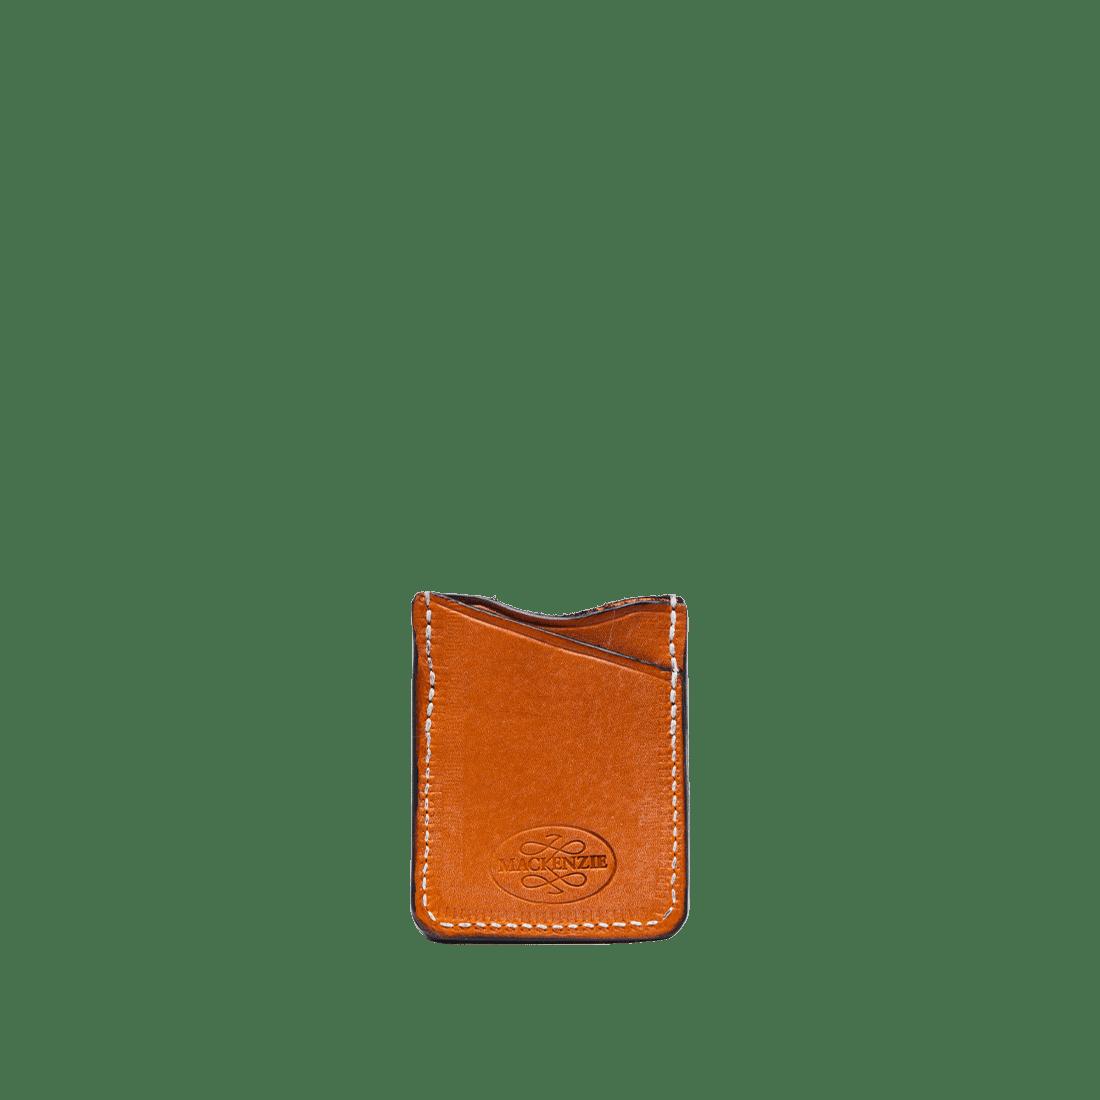 The Oak Card Holder London Tan